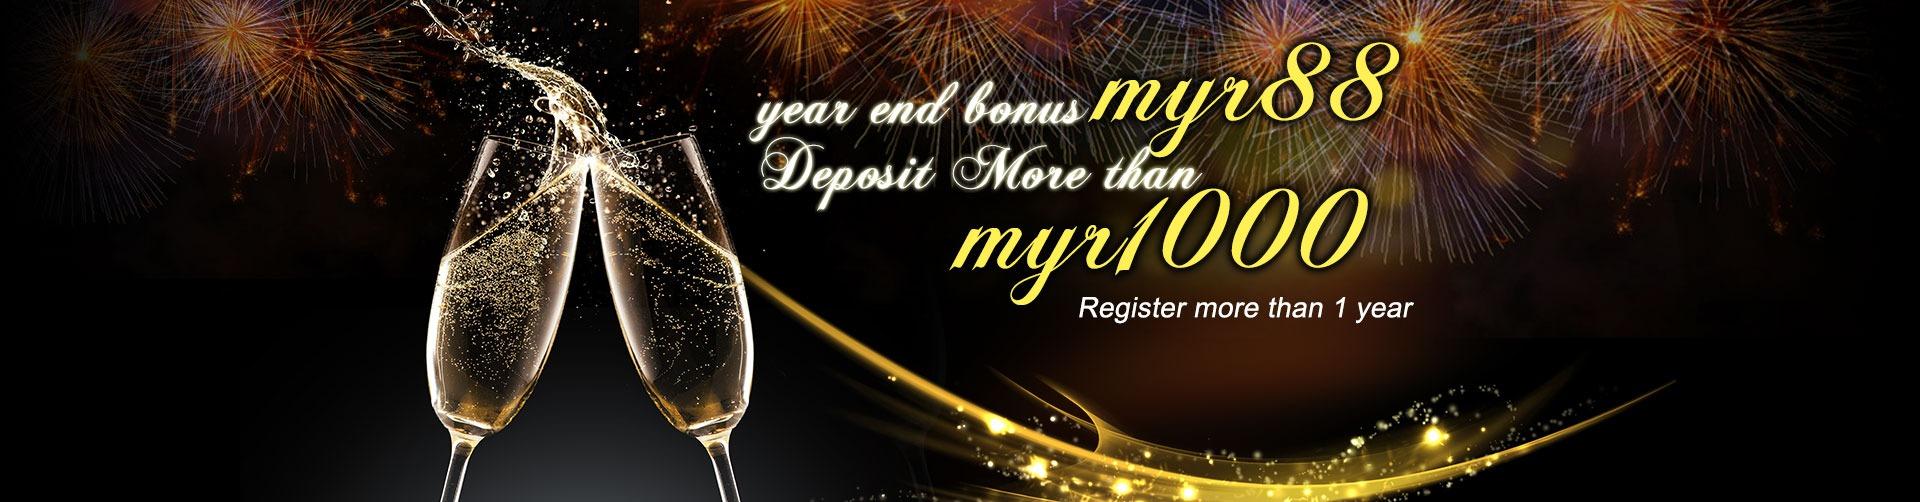 Free kredit YEAR_END_BONUS